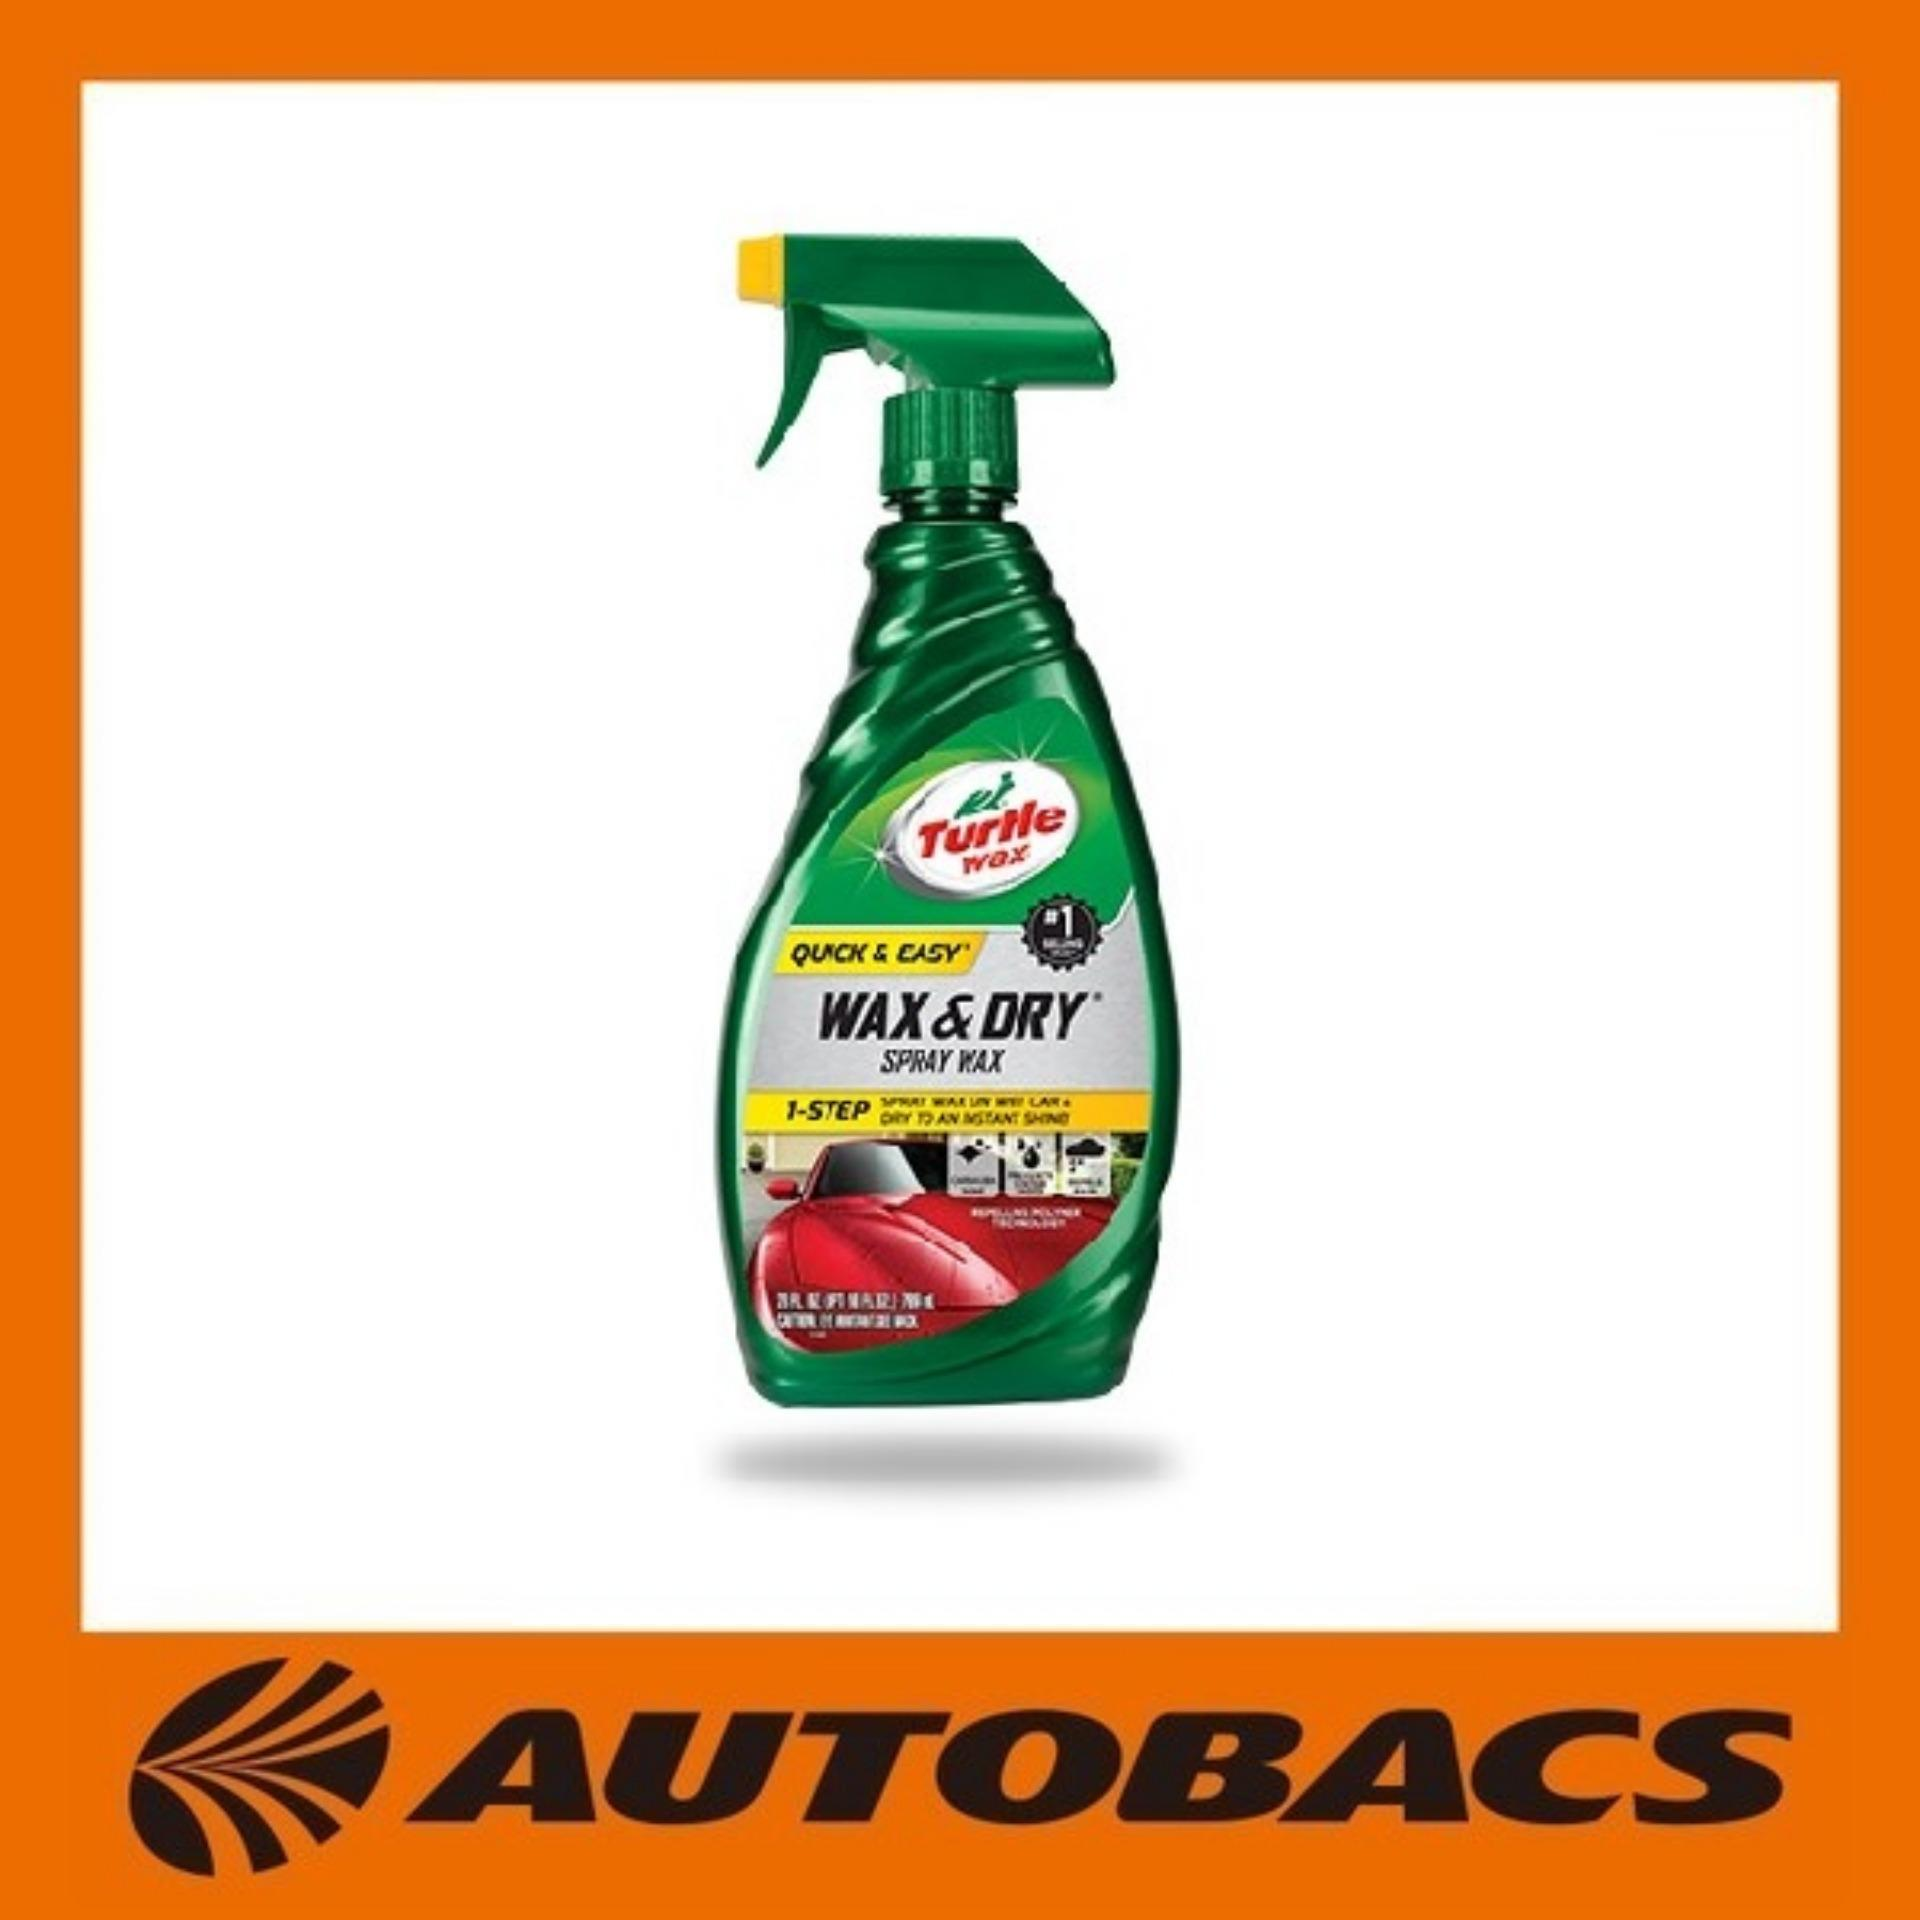 Top Rated Turtle Wax Quick Easy Wax Dry Spray Wax